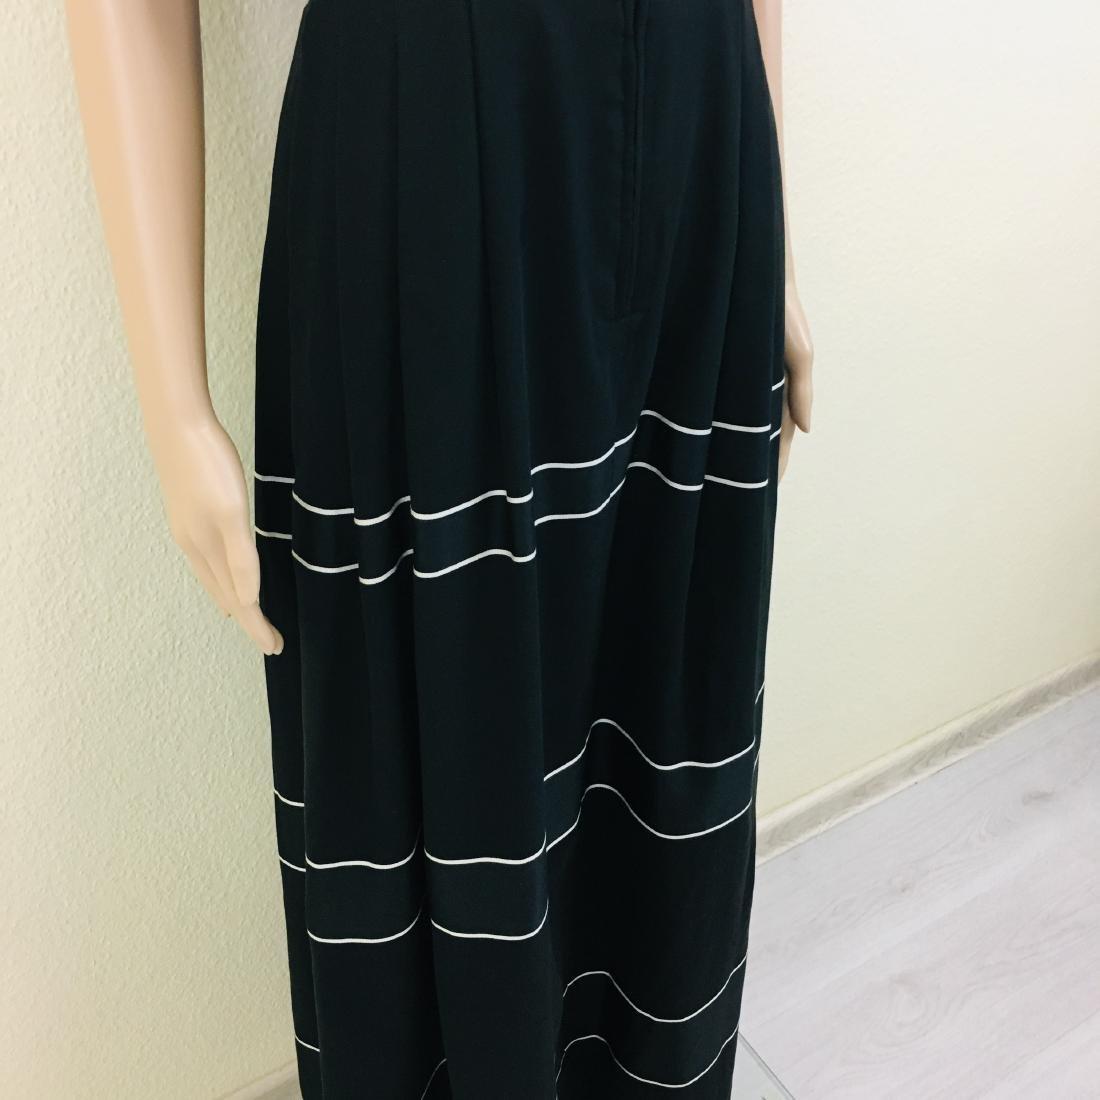 Vintage Women's Black Tyrolean Drindl Dress - 5